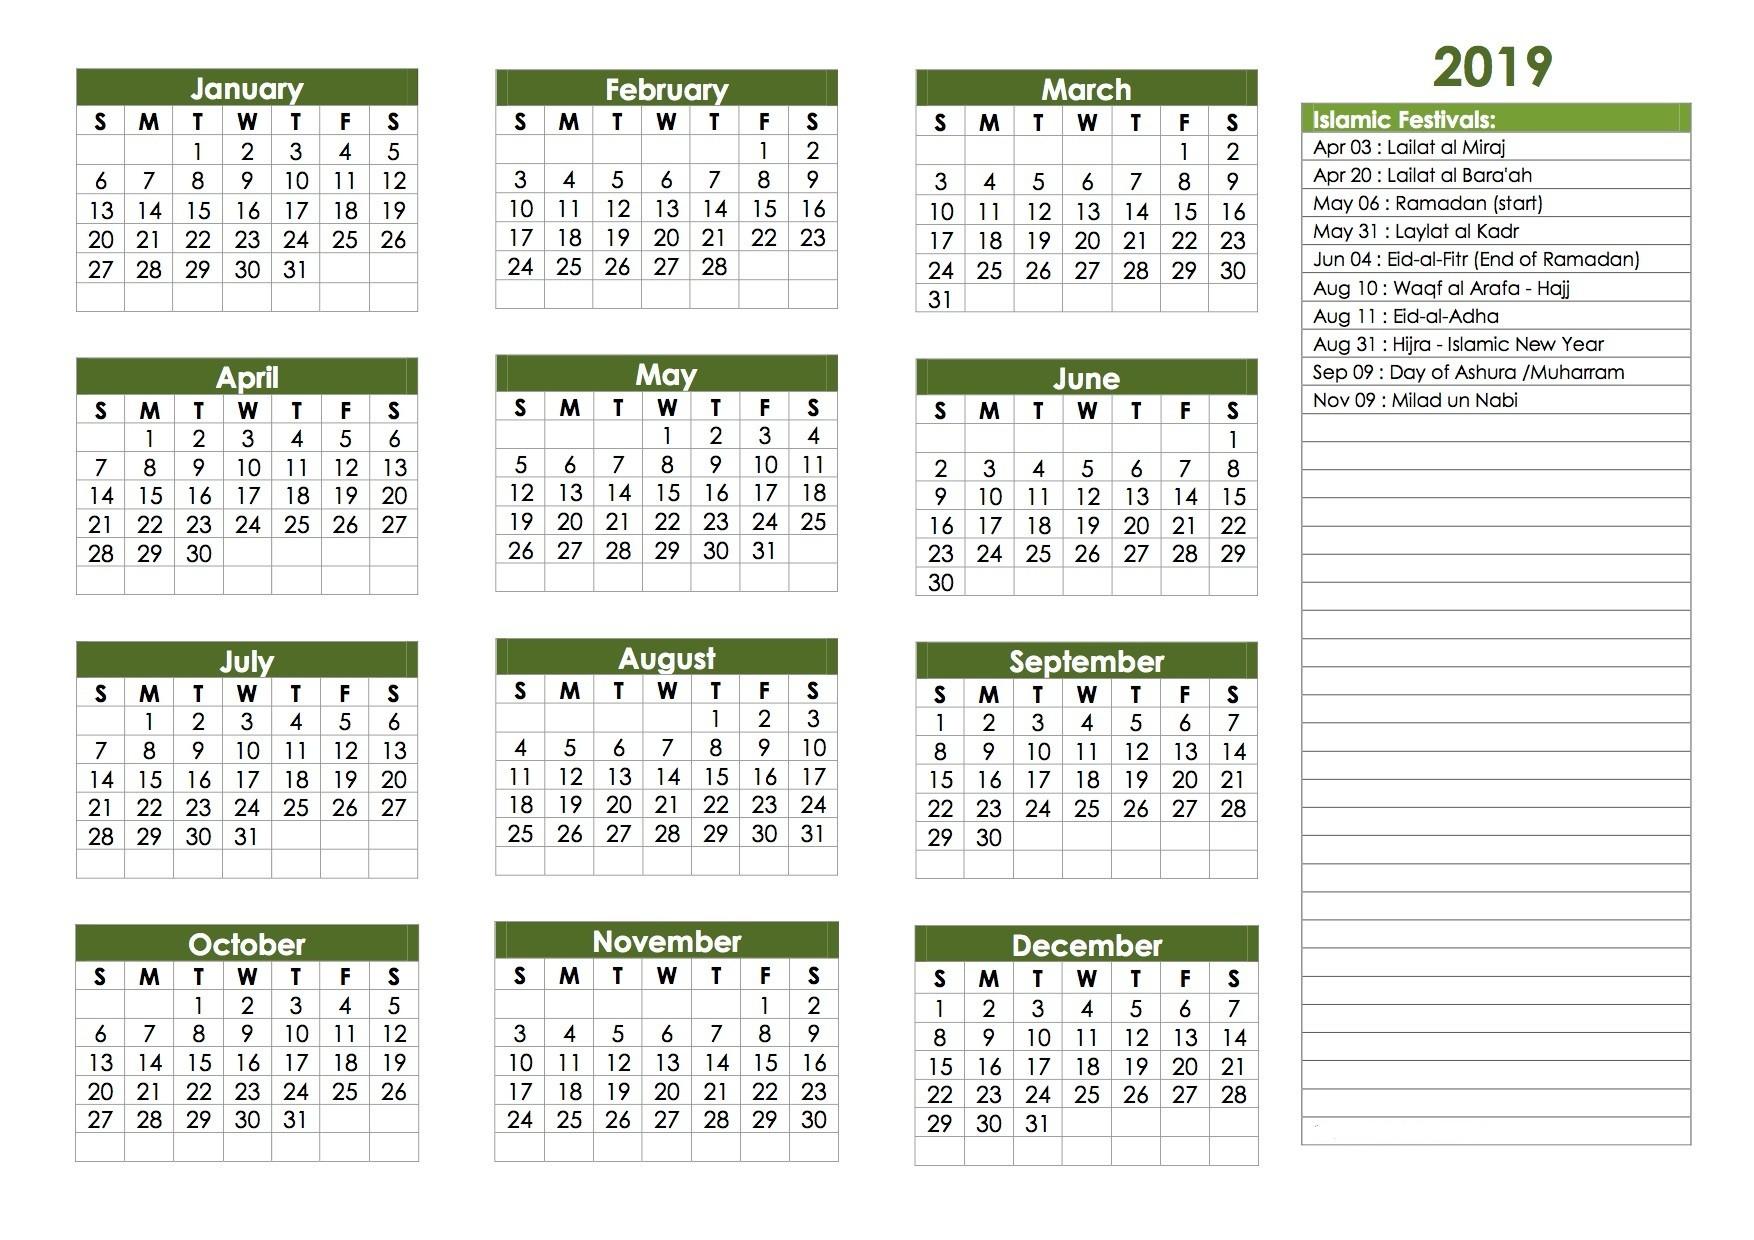 Islamic Religious Festival Holidays Calendar 2019